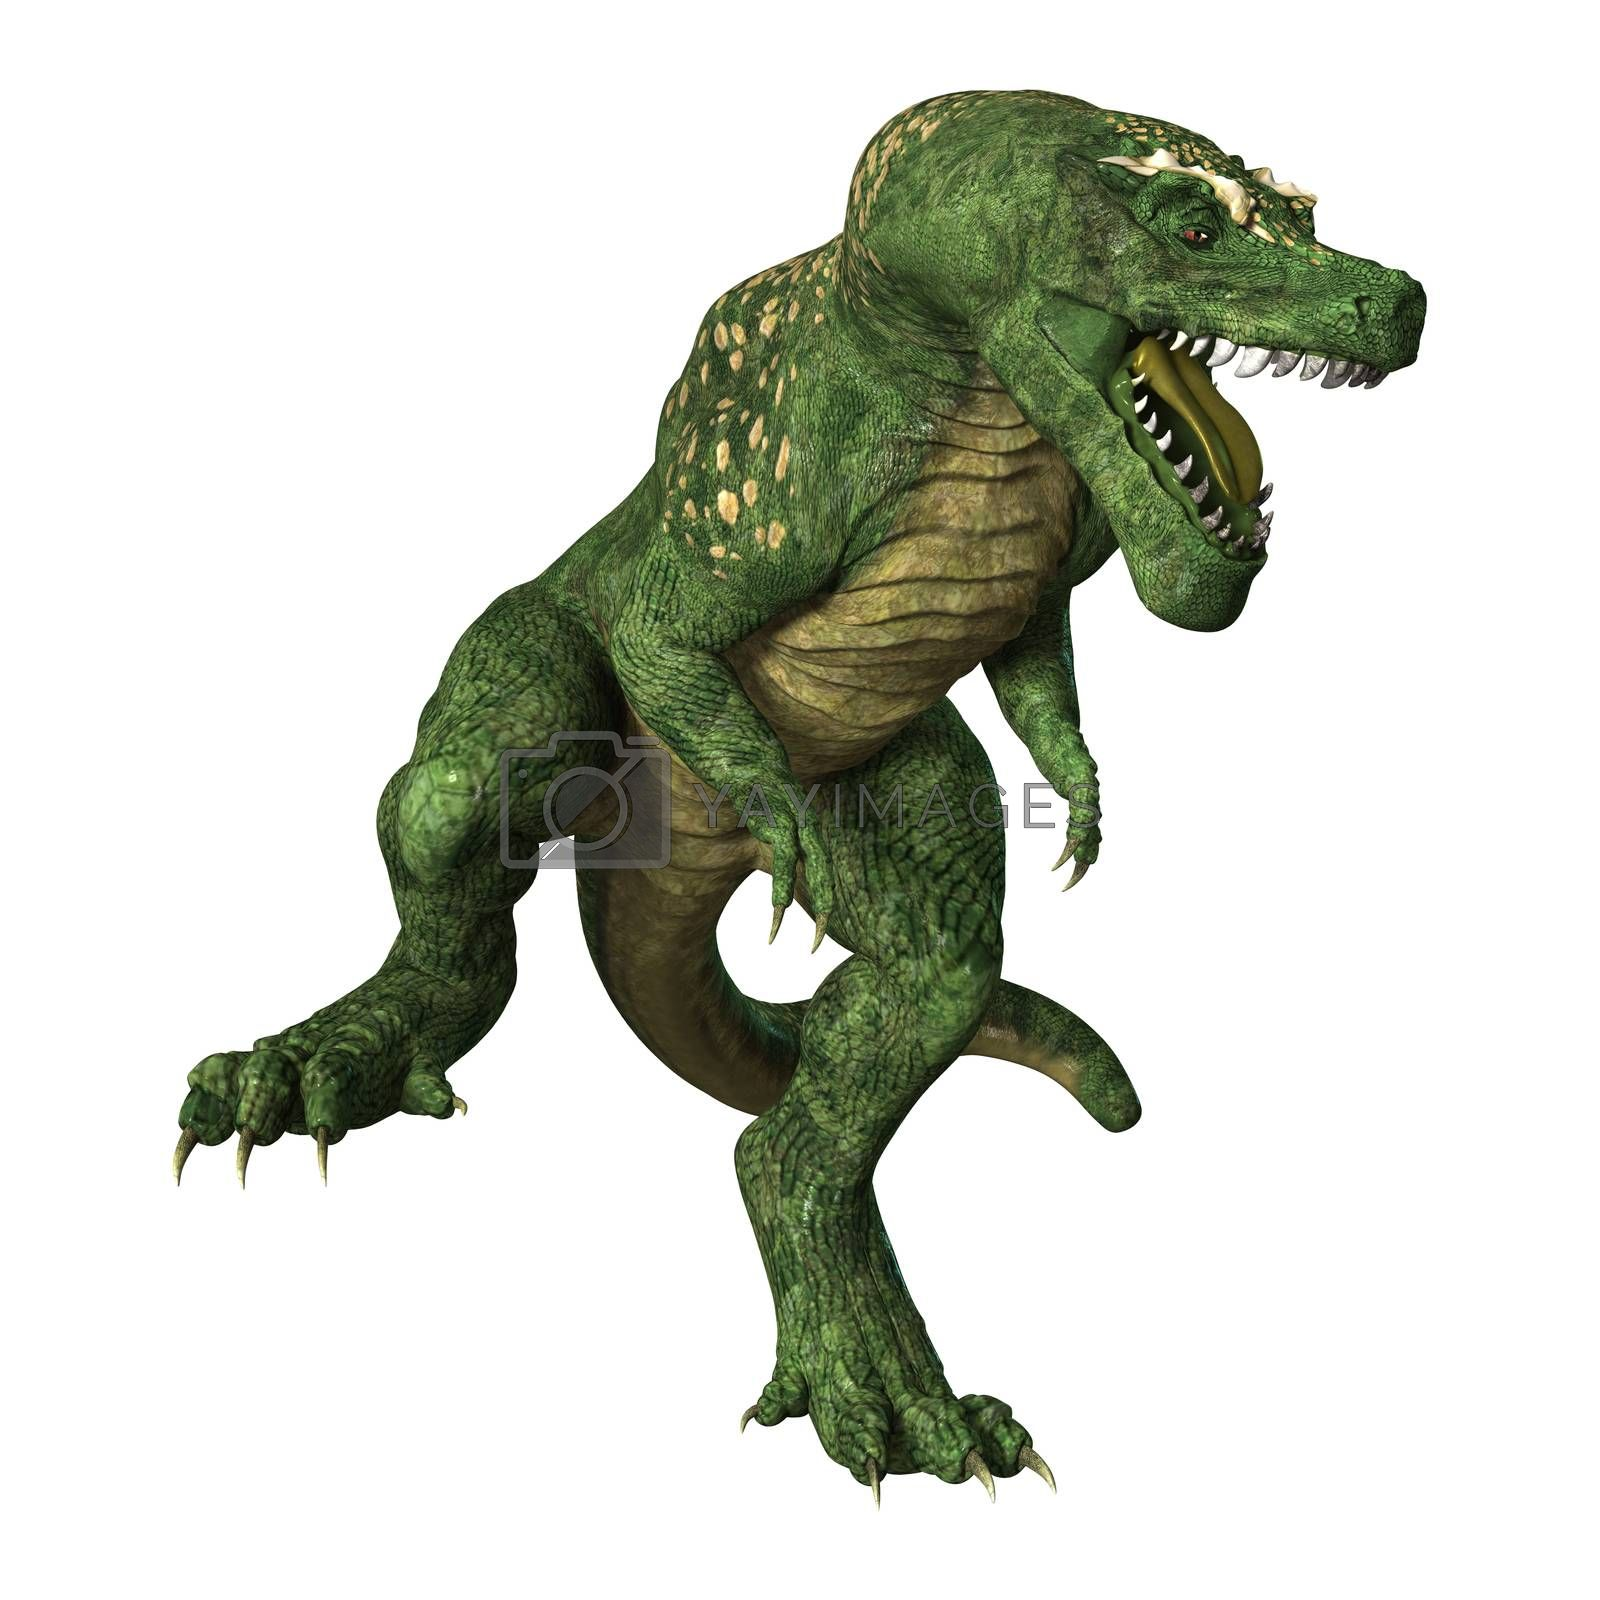 Tyrannosaurus Rex by Vac